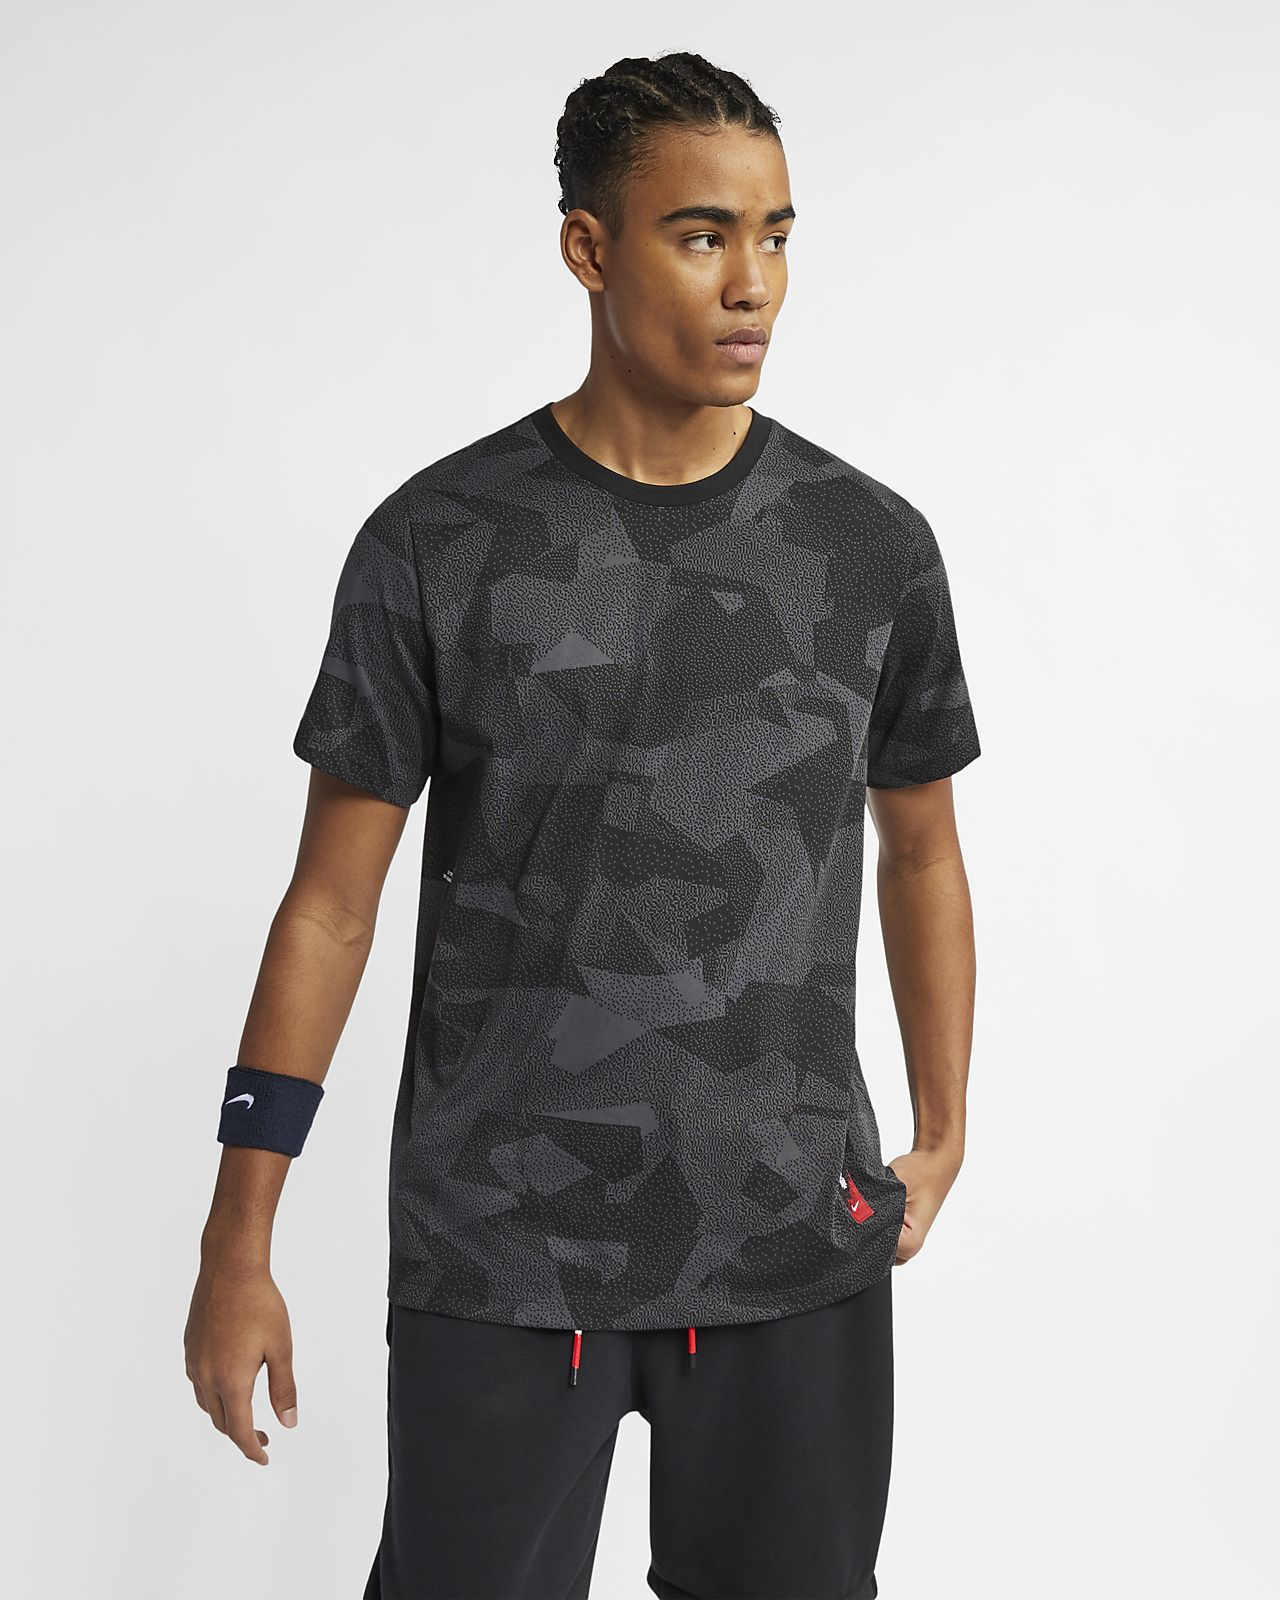 Nike Dri-FIT Kyrie-T-shirt til mænd